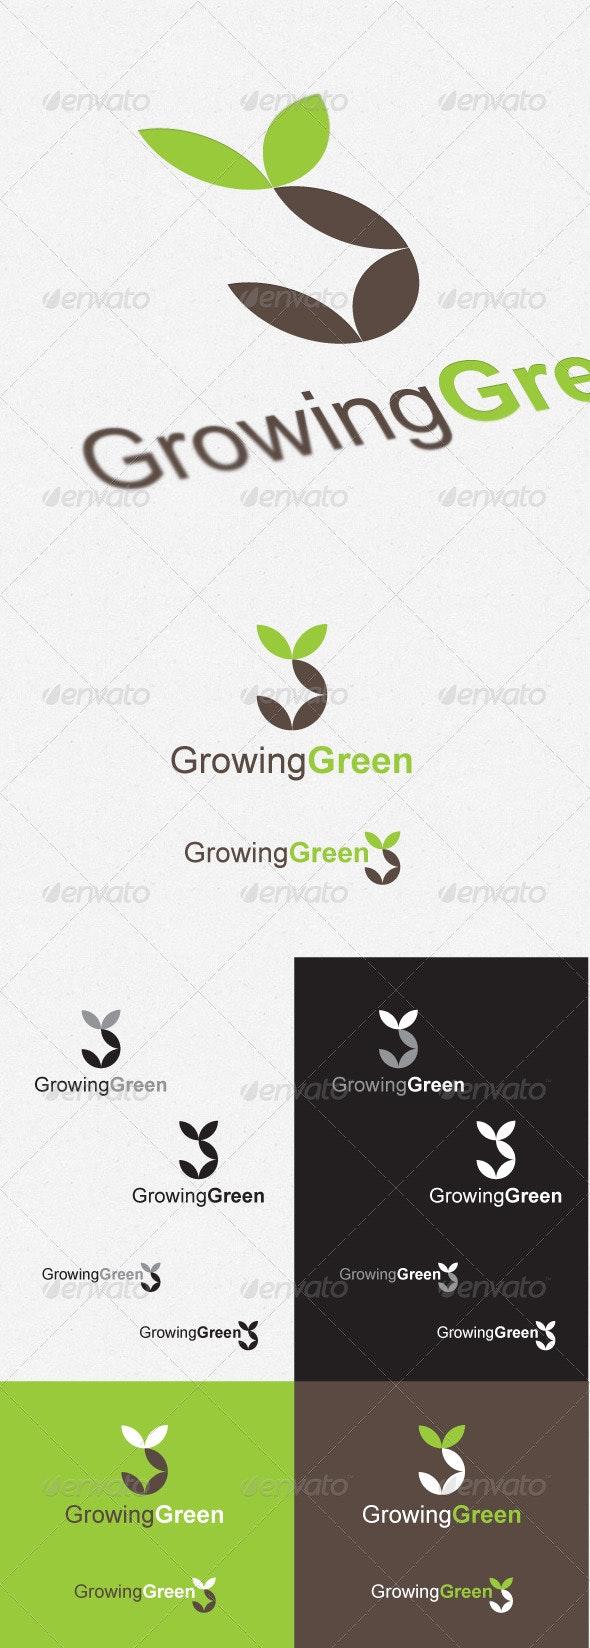 Growing Green - Logo Templates